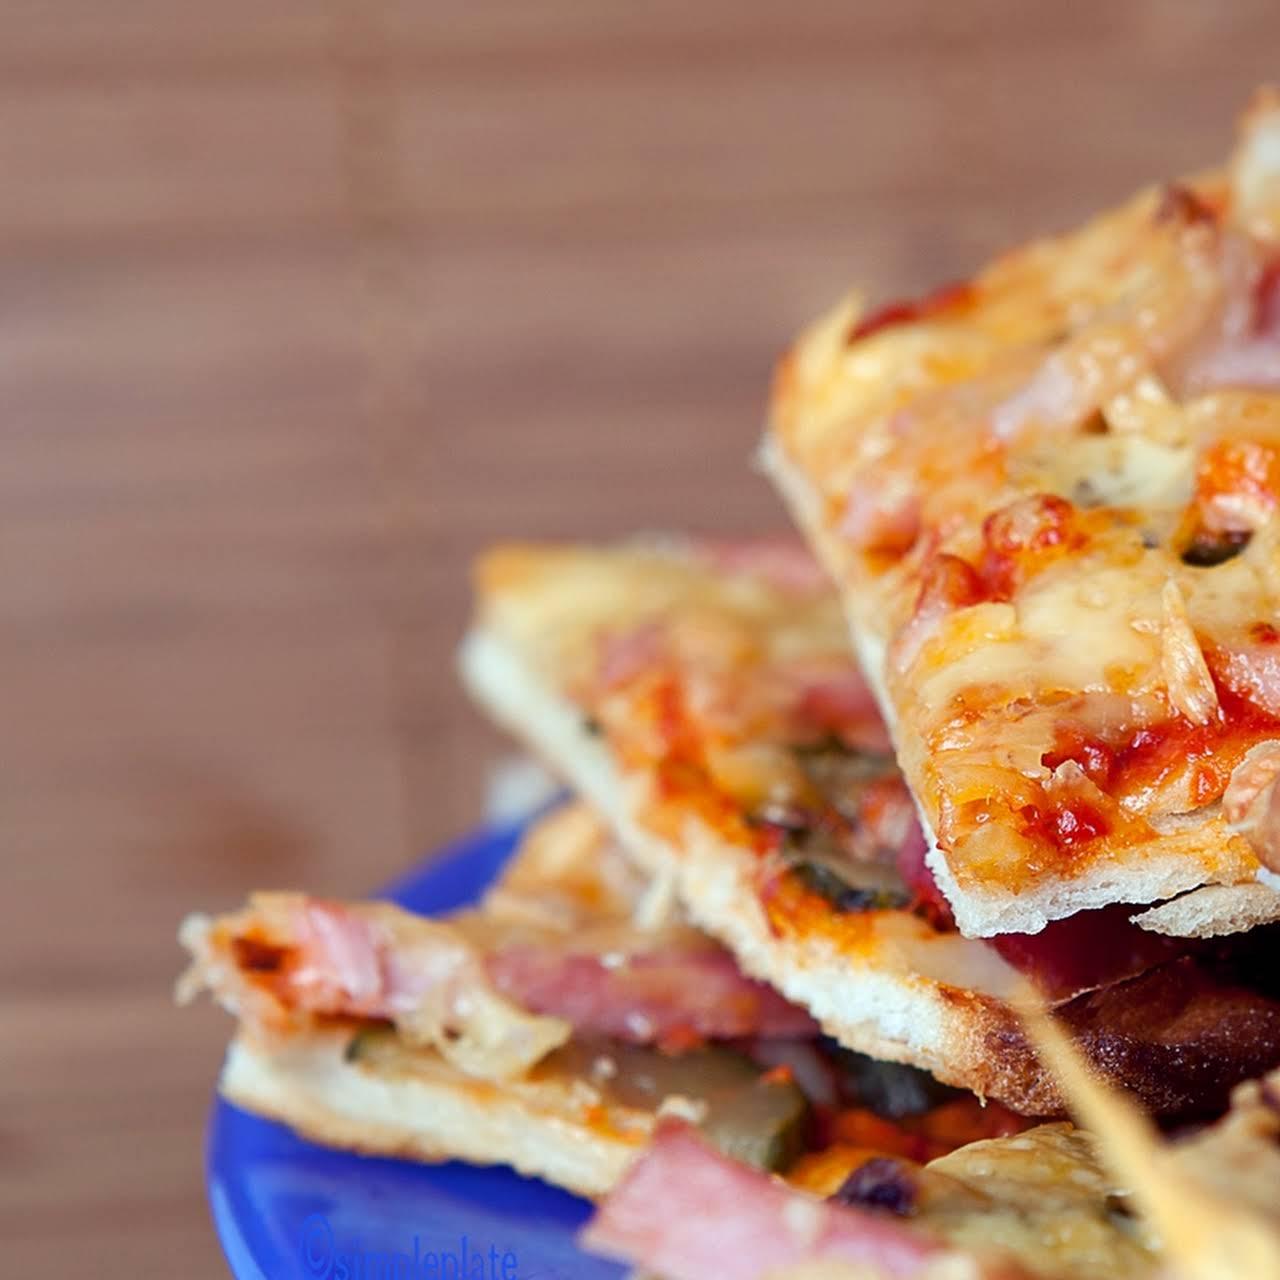 Homemade GF Pizza